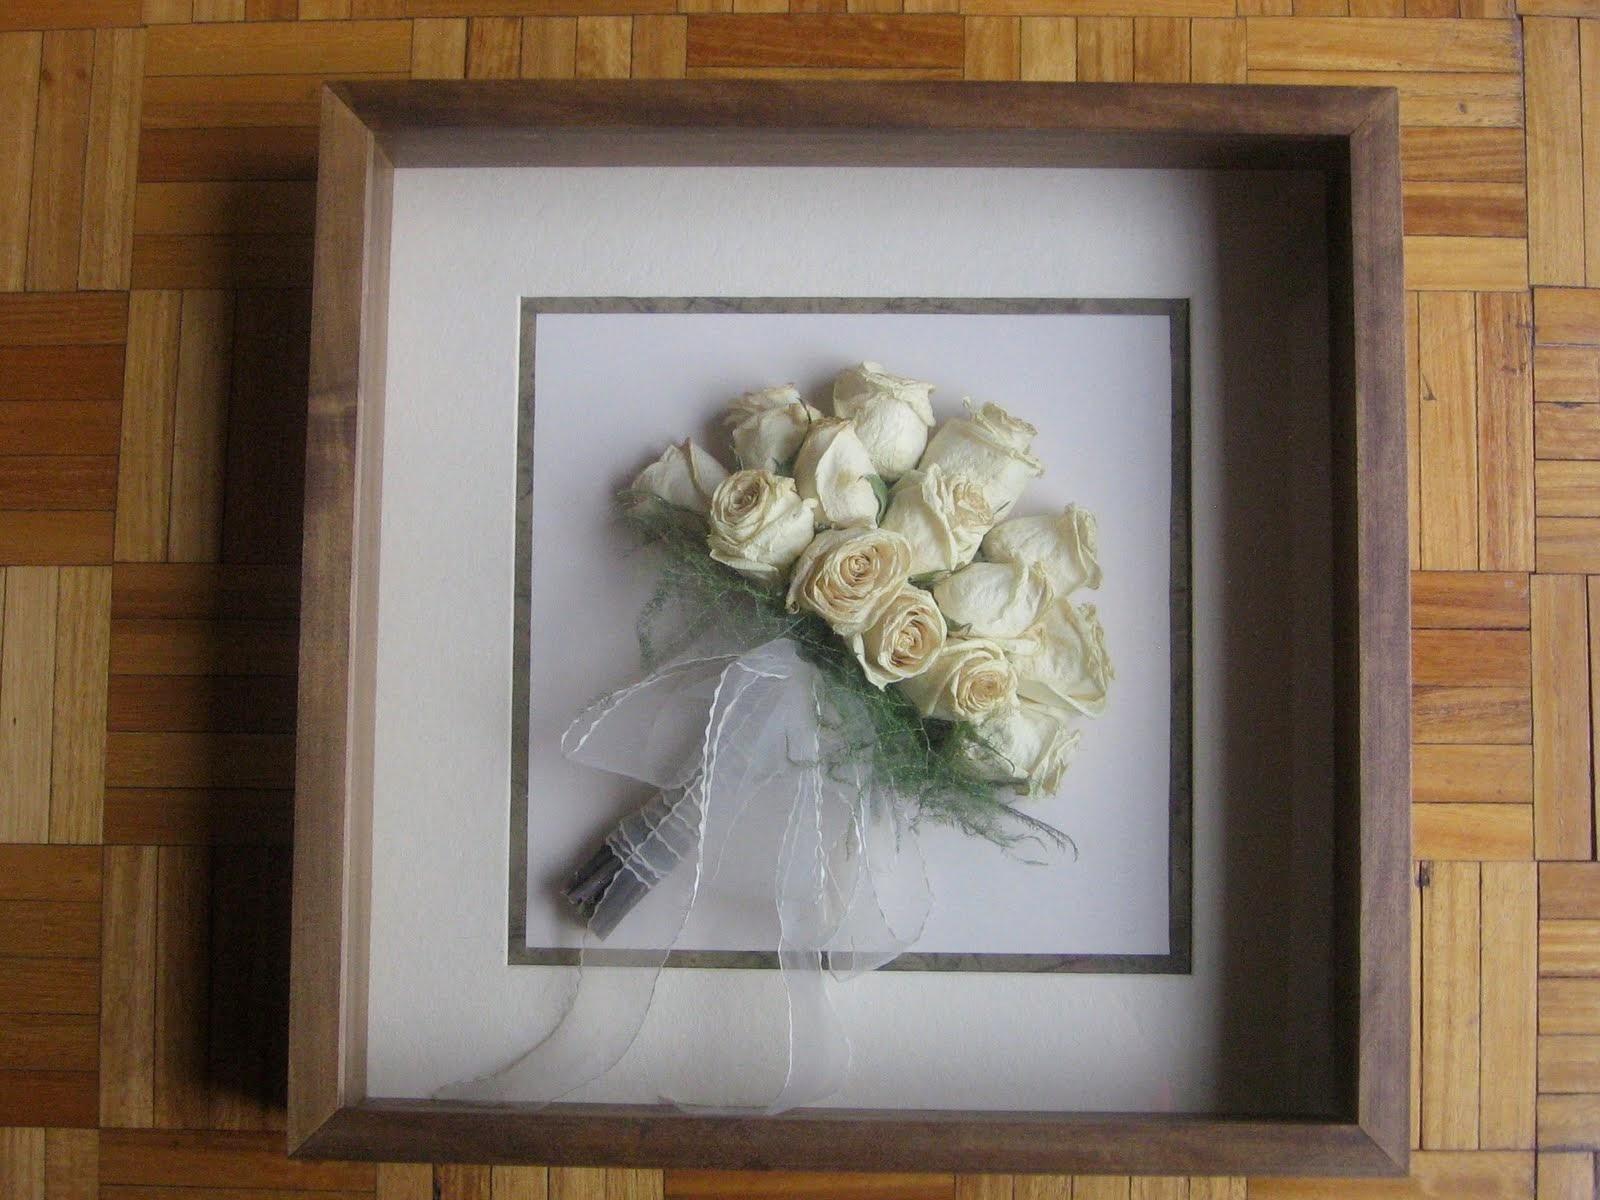 Conservación de ramos de novia